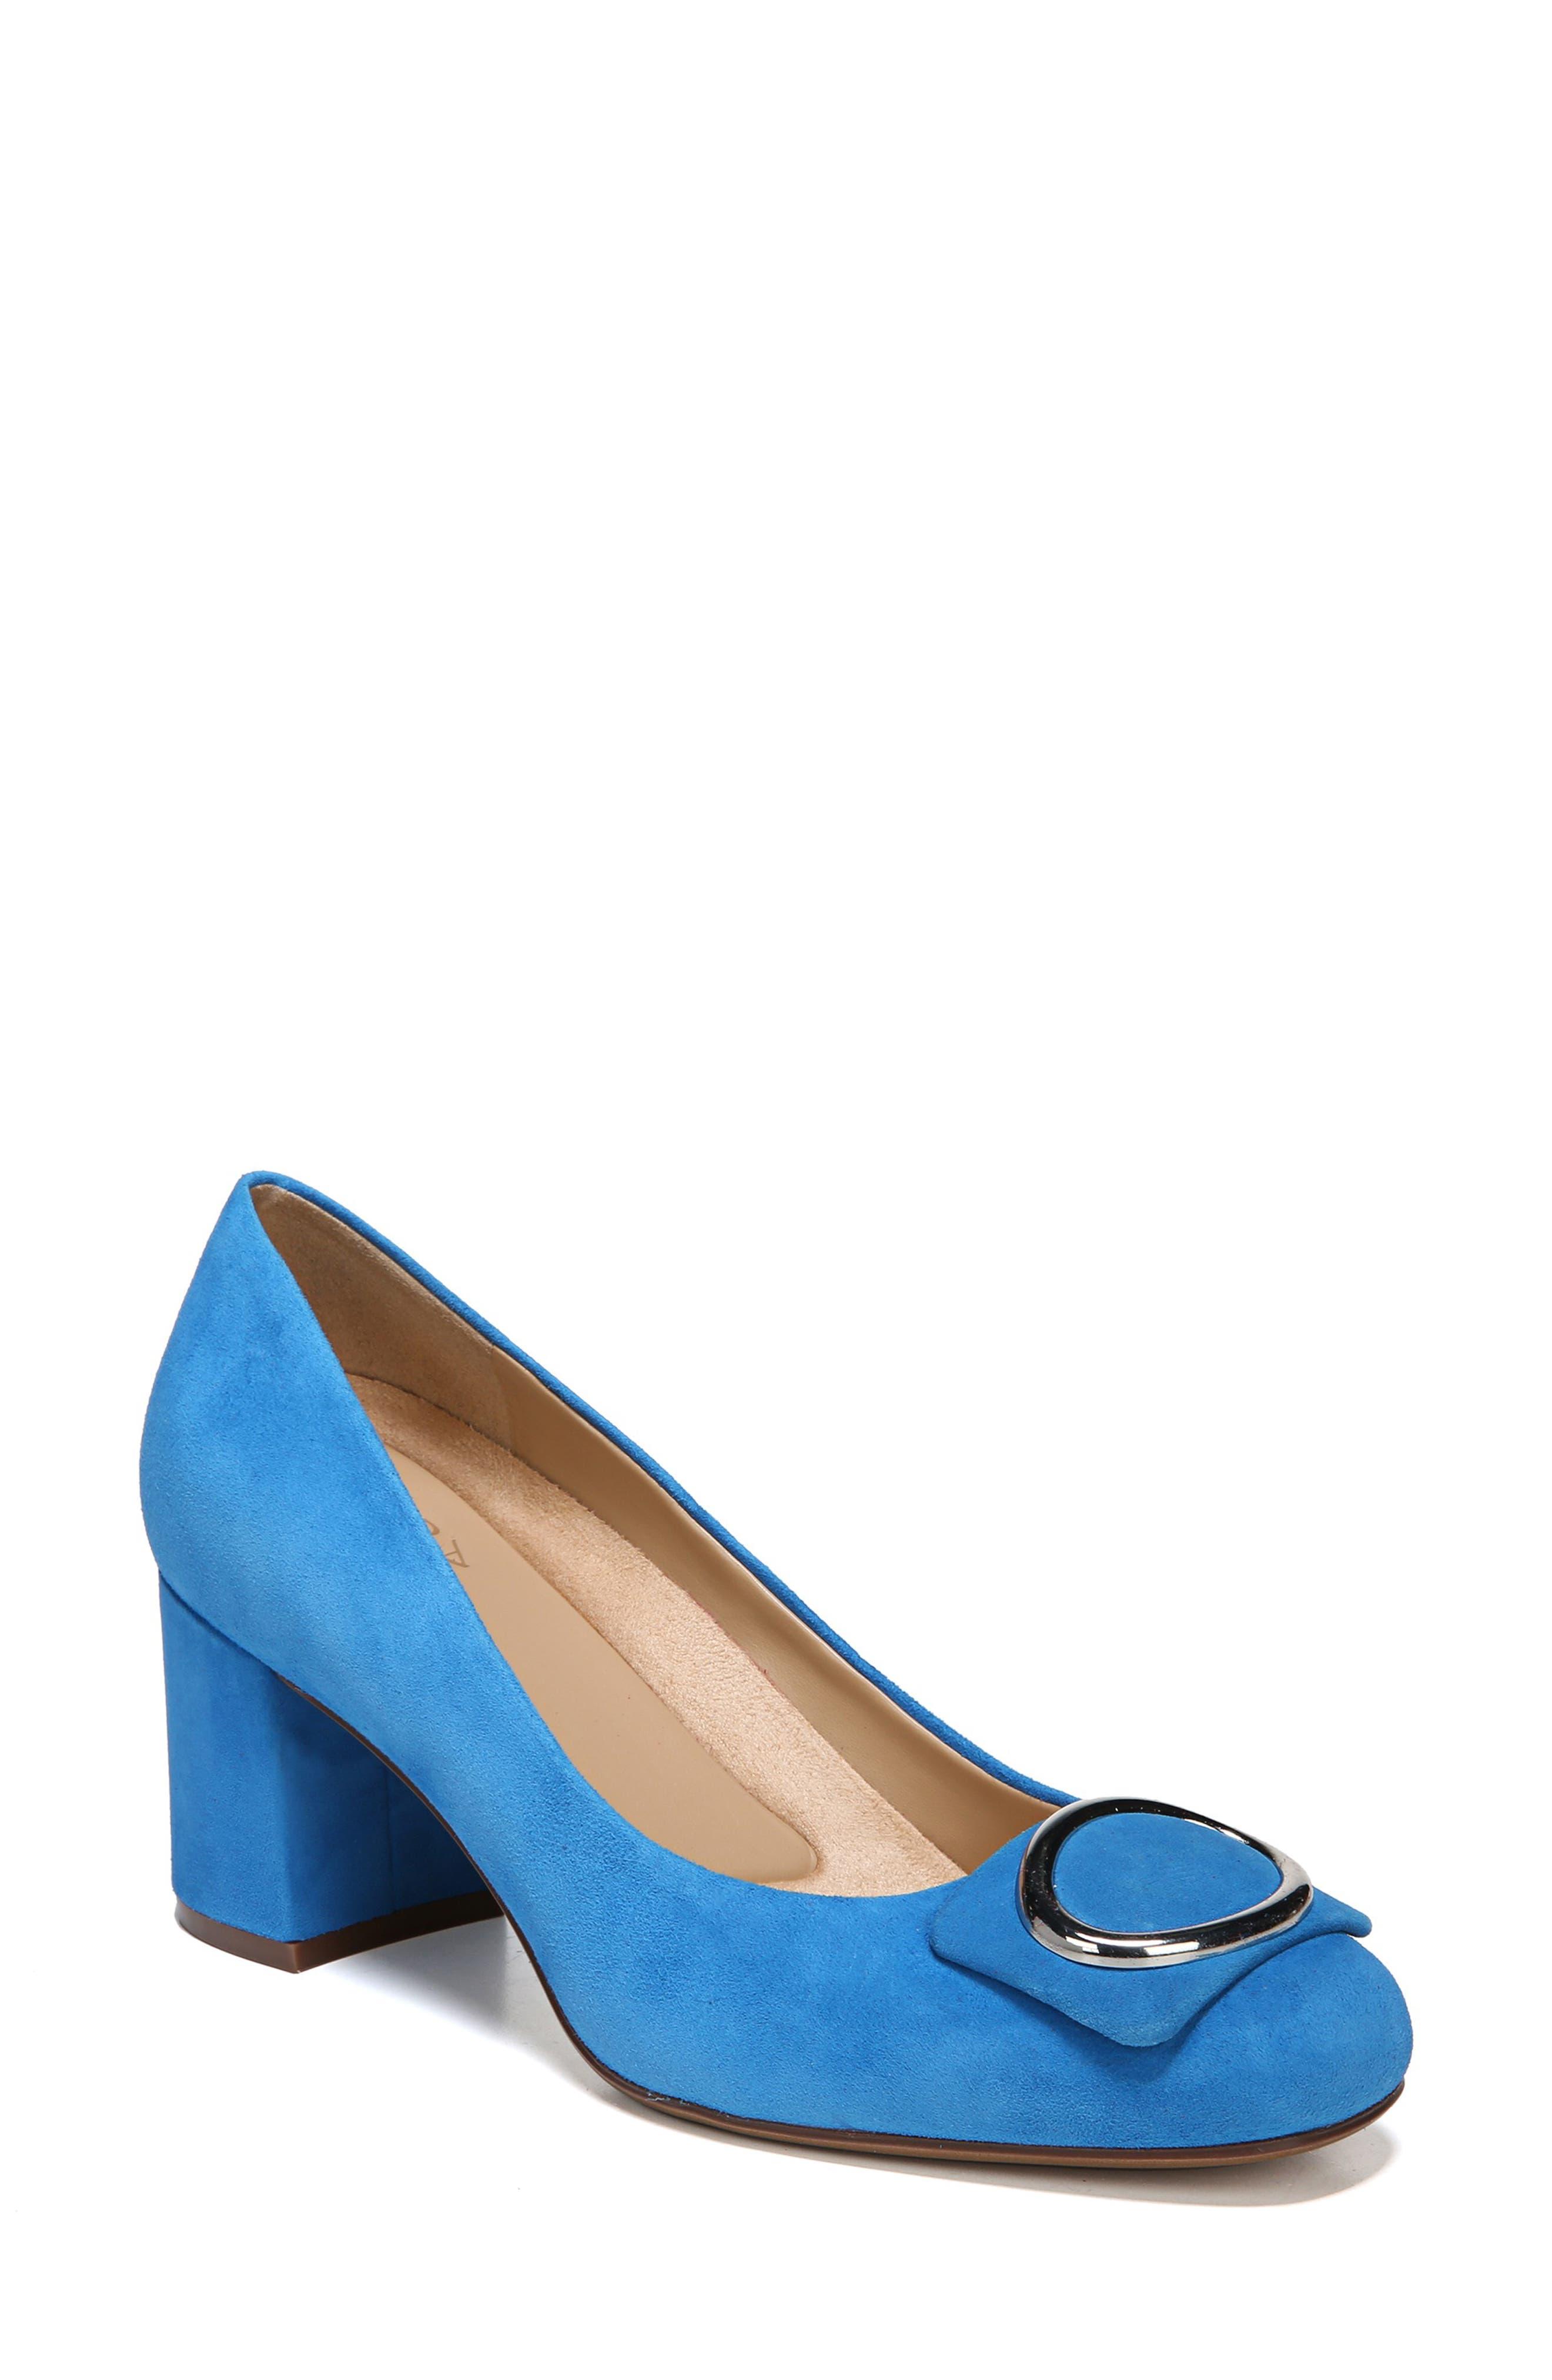 Wright Pump,                         Main,                         color, Bauhaus Blue Suede